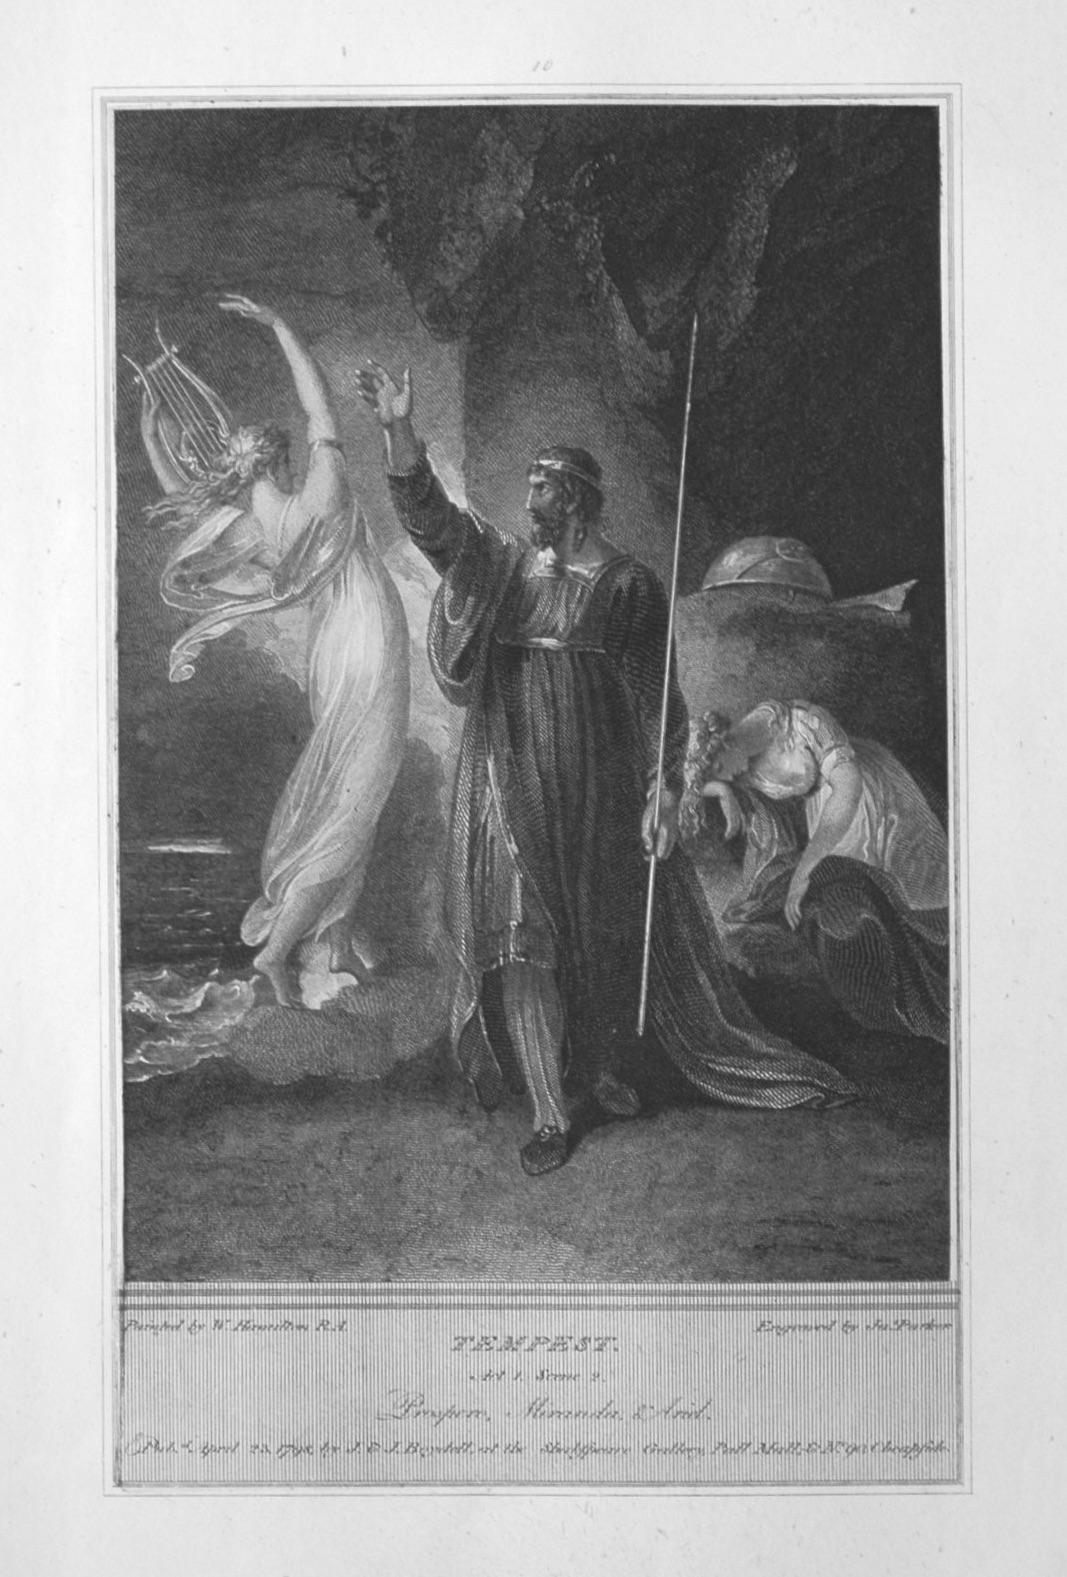 Tempest. Act 1, Scene 2. Prospero, Miranda & Ariel.